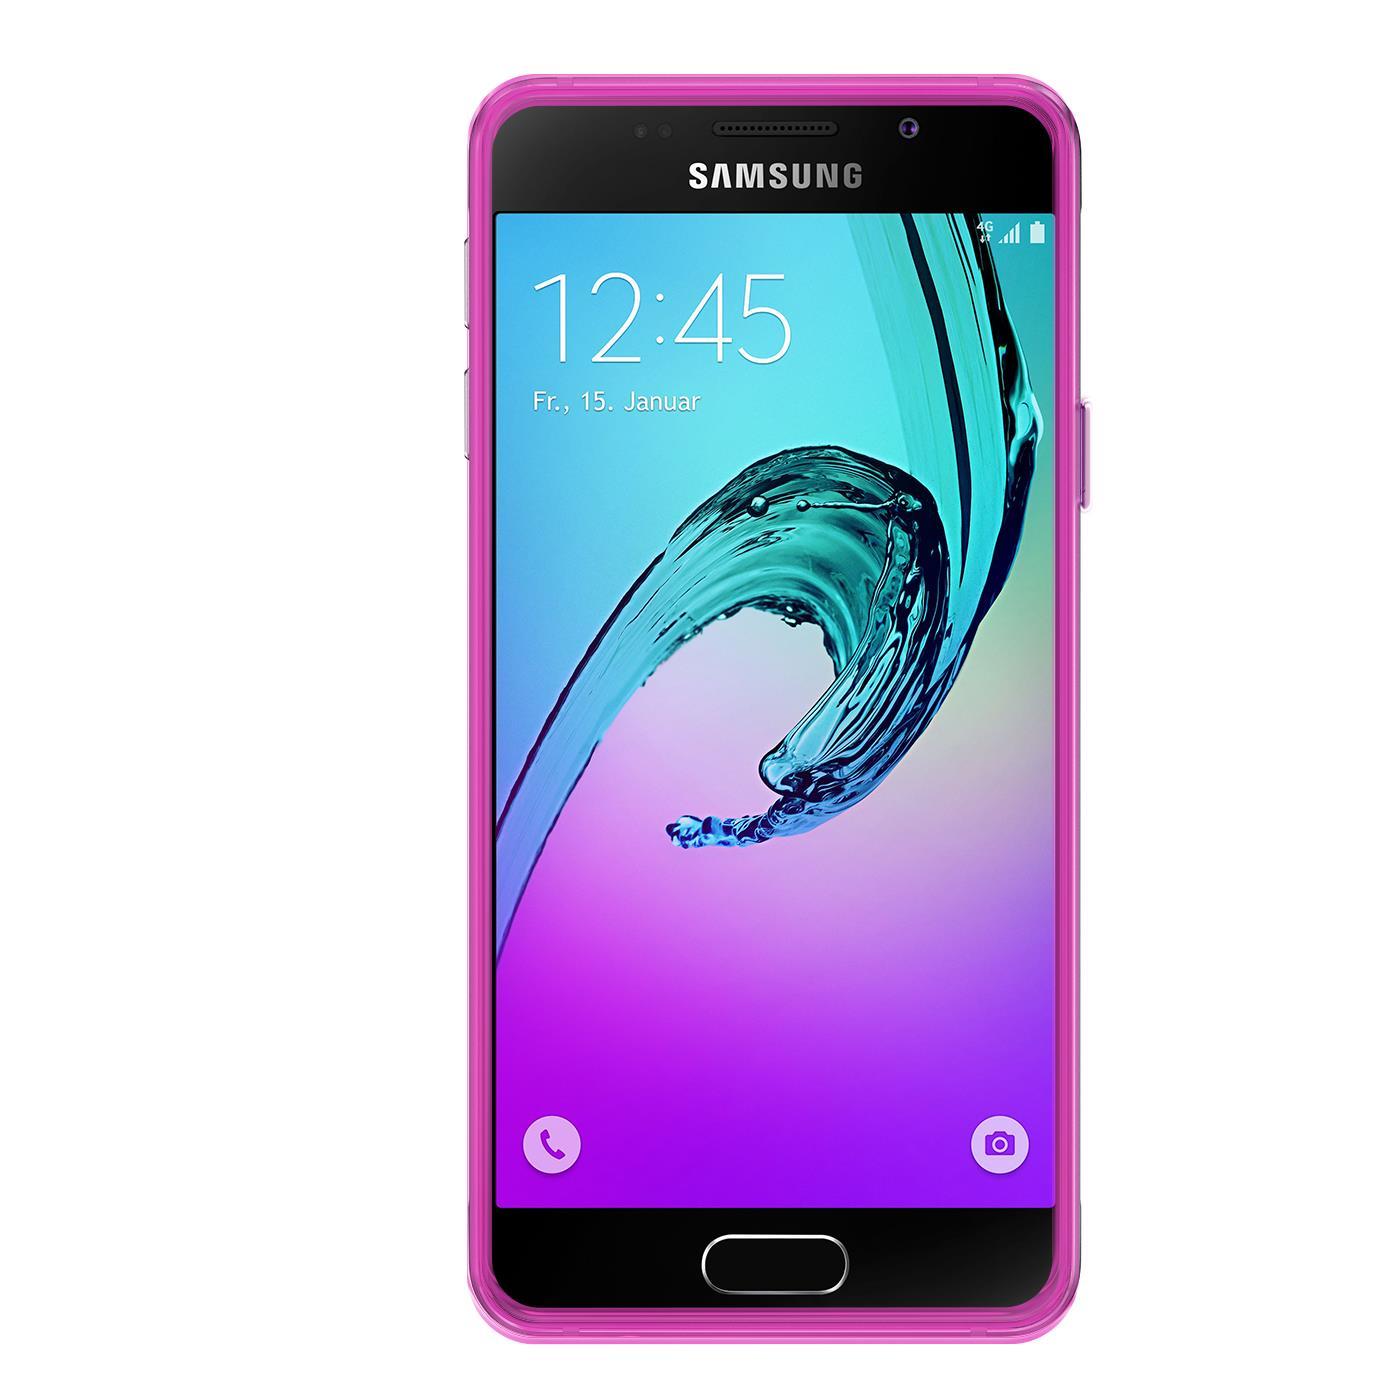 Samsung-Galaxy-a3-2016-Thin-Silikon-Klar-Case-Cover-Ultra-Slim-Stossfeste-Gel Indexbild 25